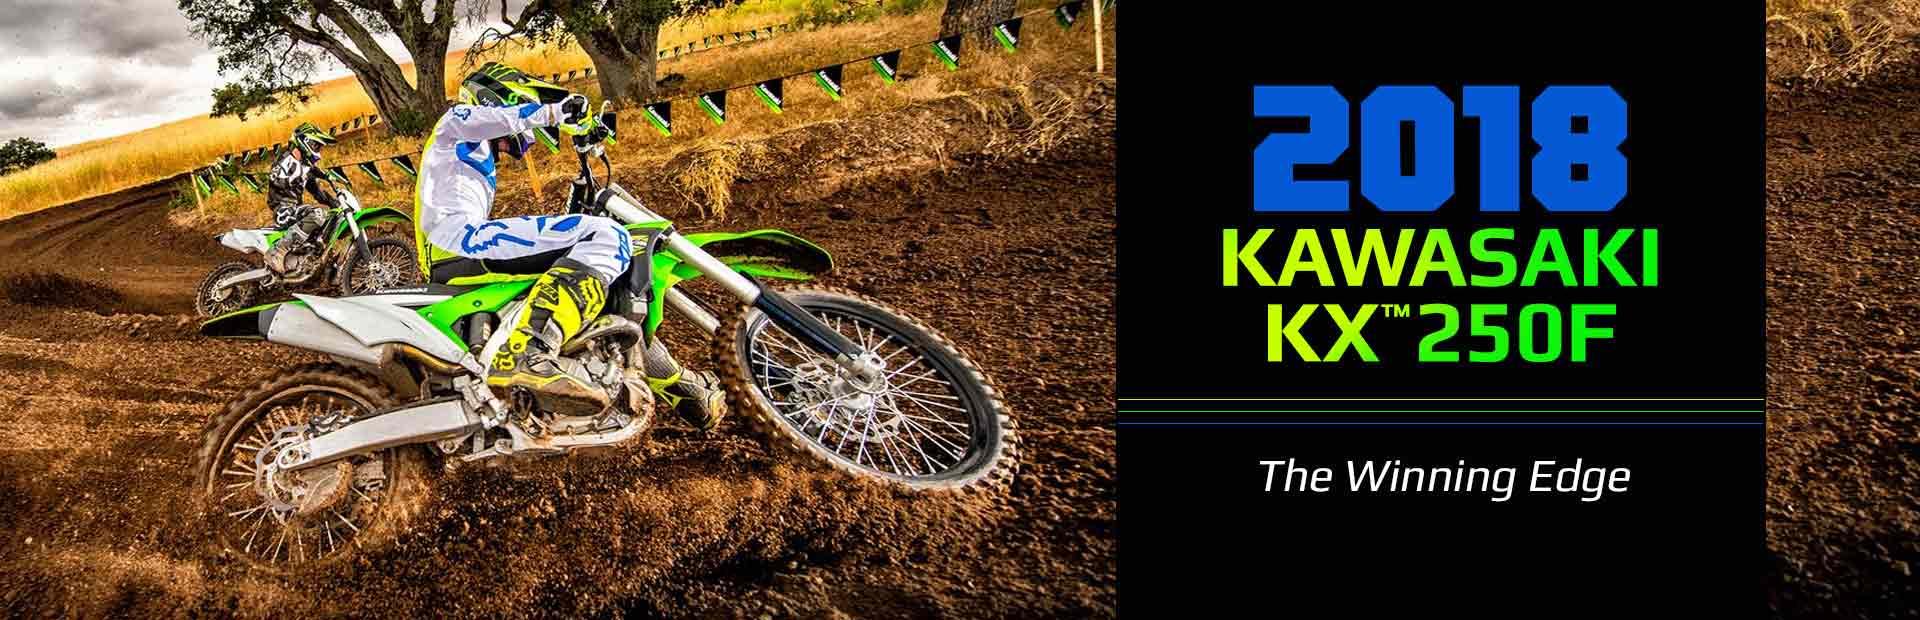 2018 Kawasaki KX™250F: Click here to view the model.